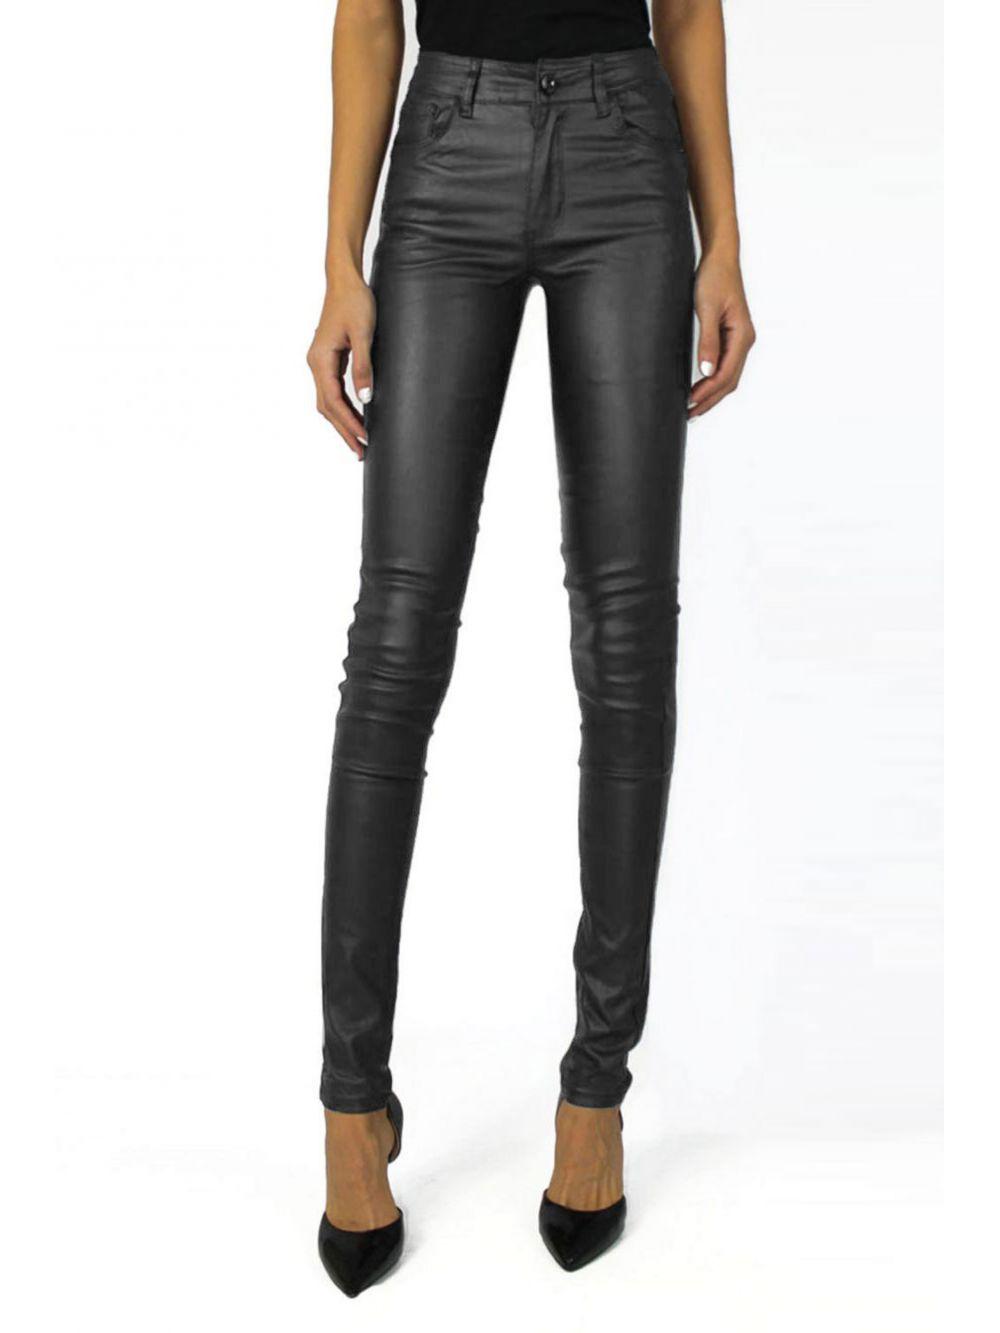 Jeans Simili cuir Push Up